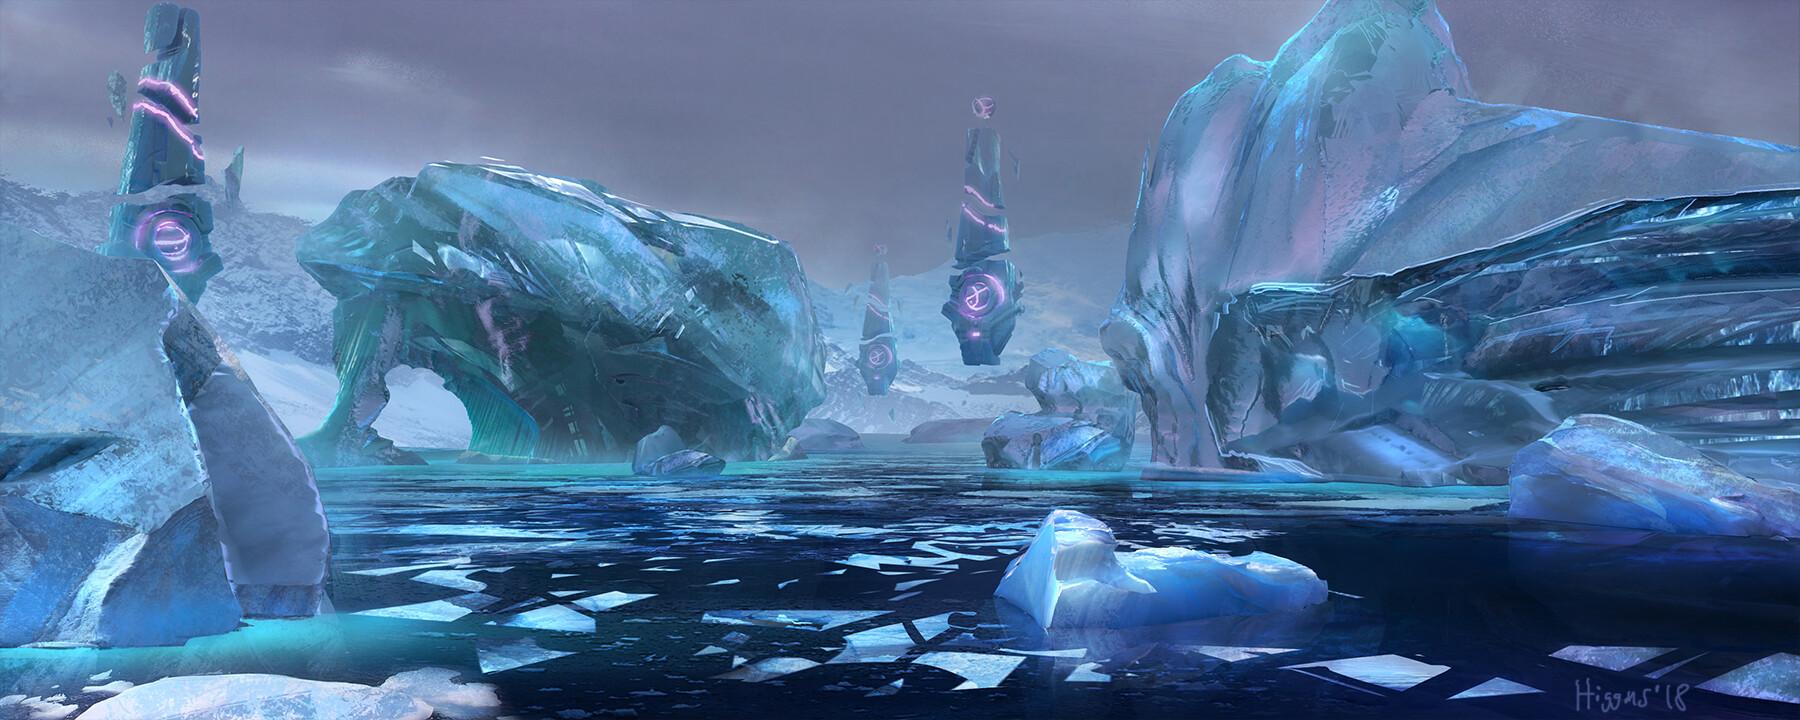 Brian higgins icezone web